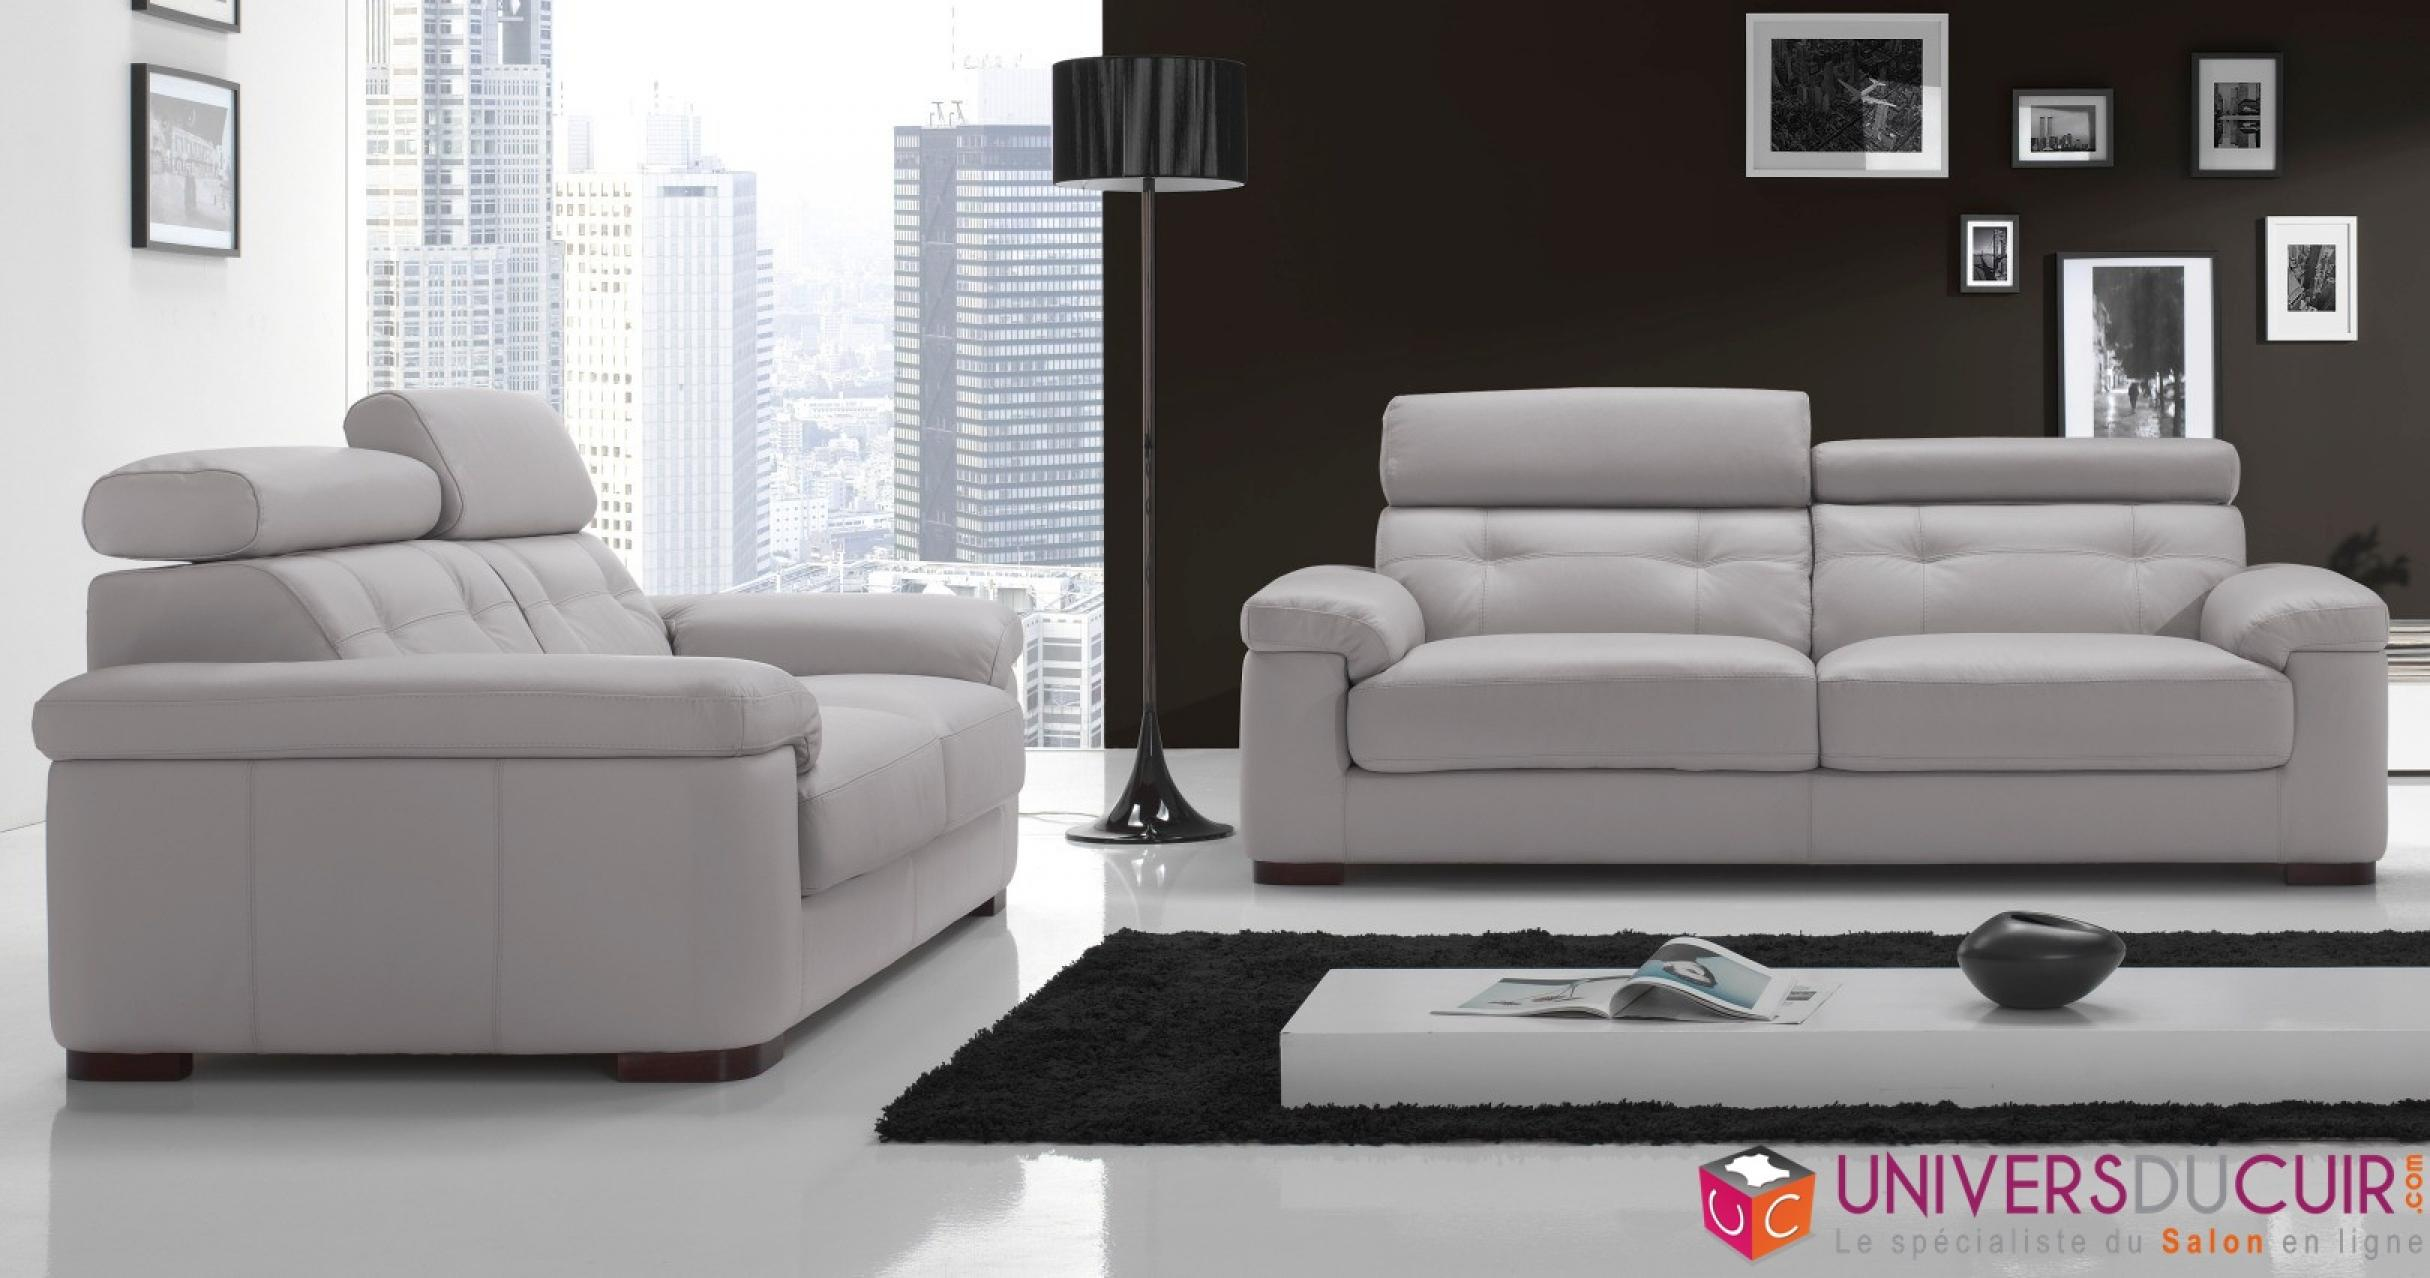 Canapé Friheten Ikea Luxe Stock Centralillaw Design De Maison